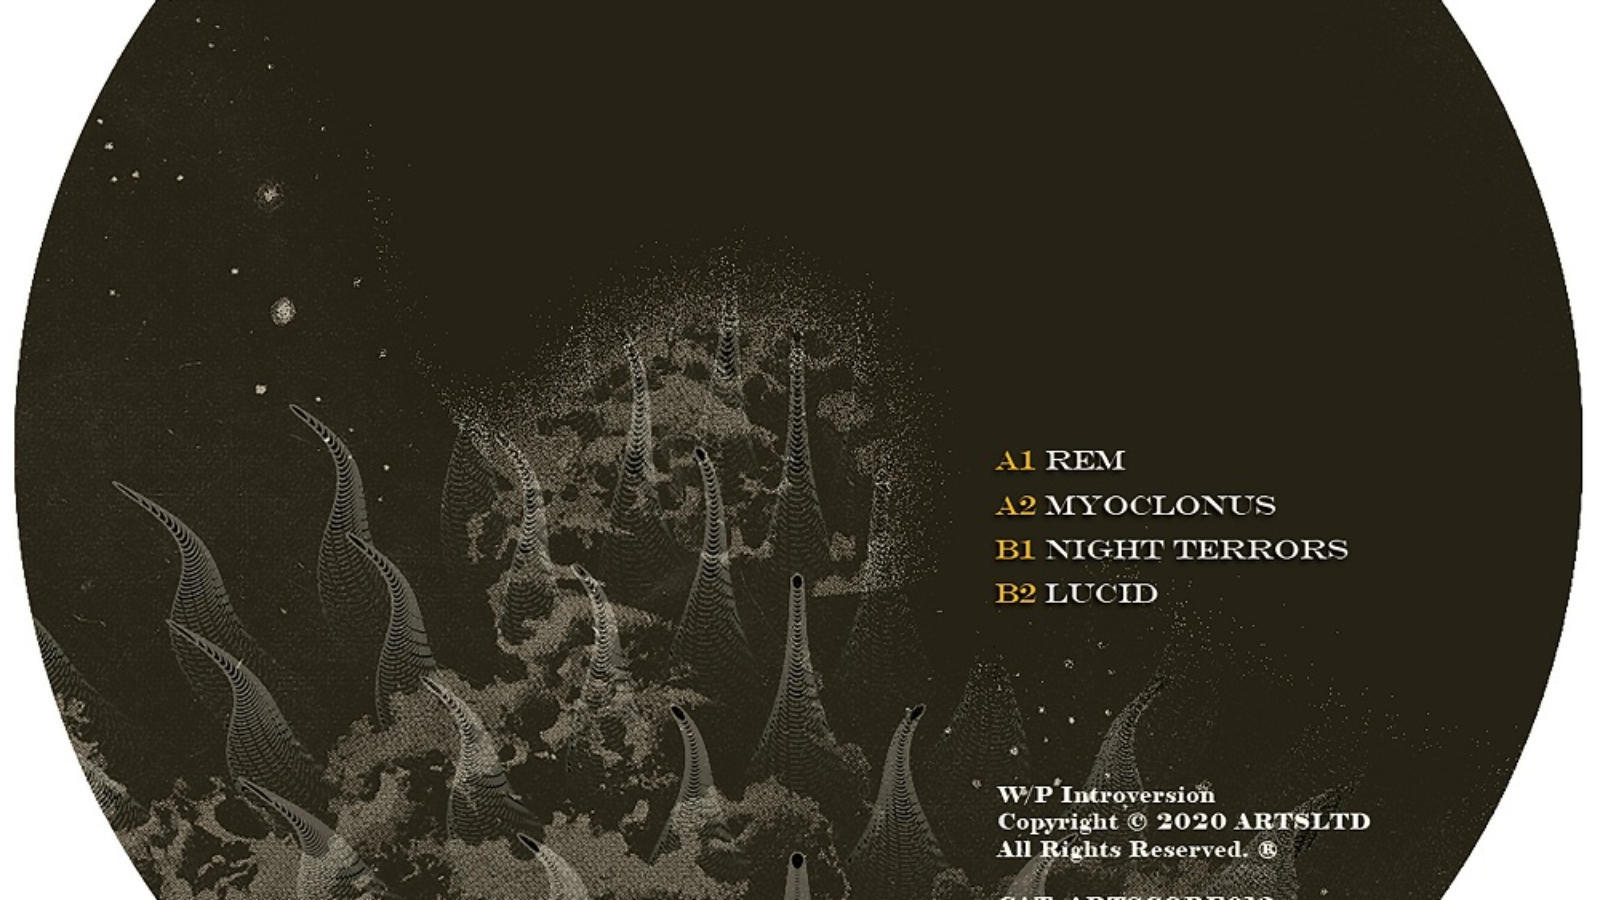 00-ARTSCORE013-Introvrsion_DEF-a_3000digi